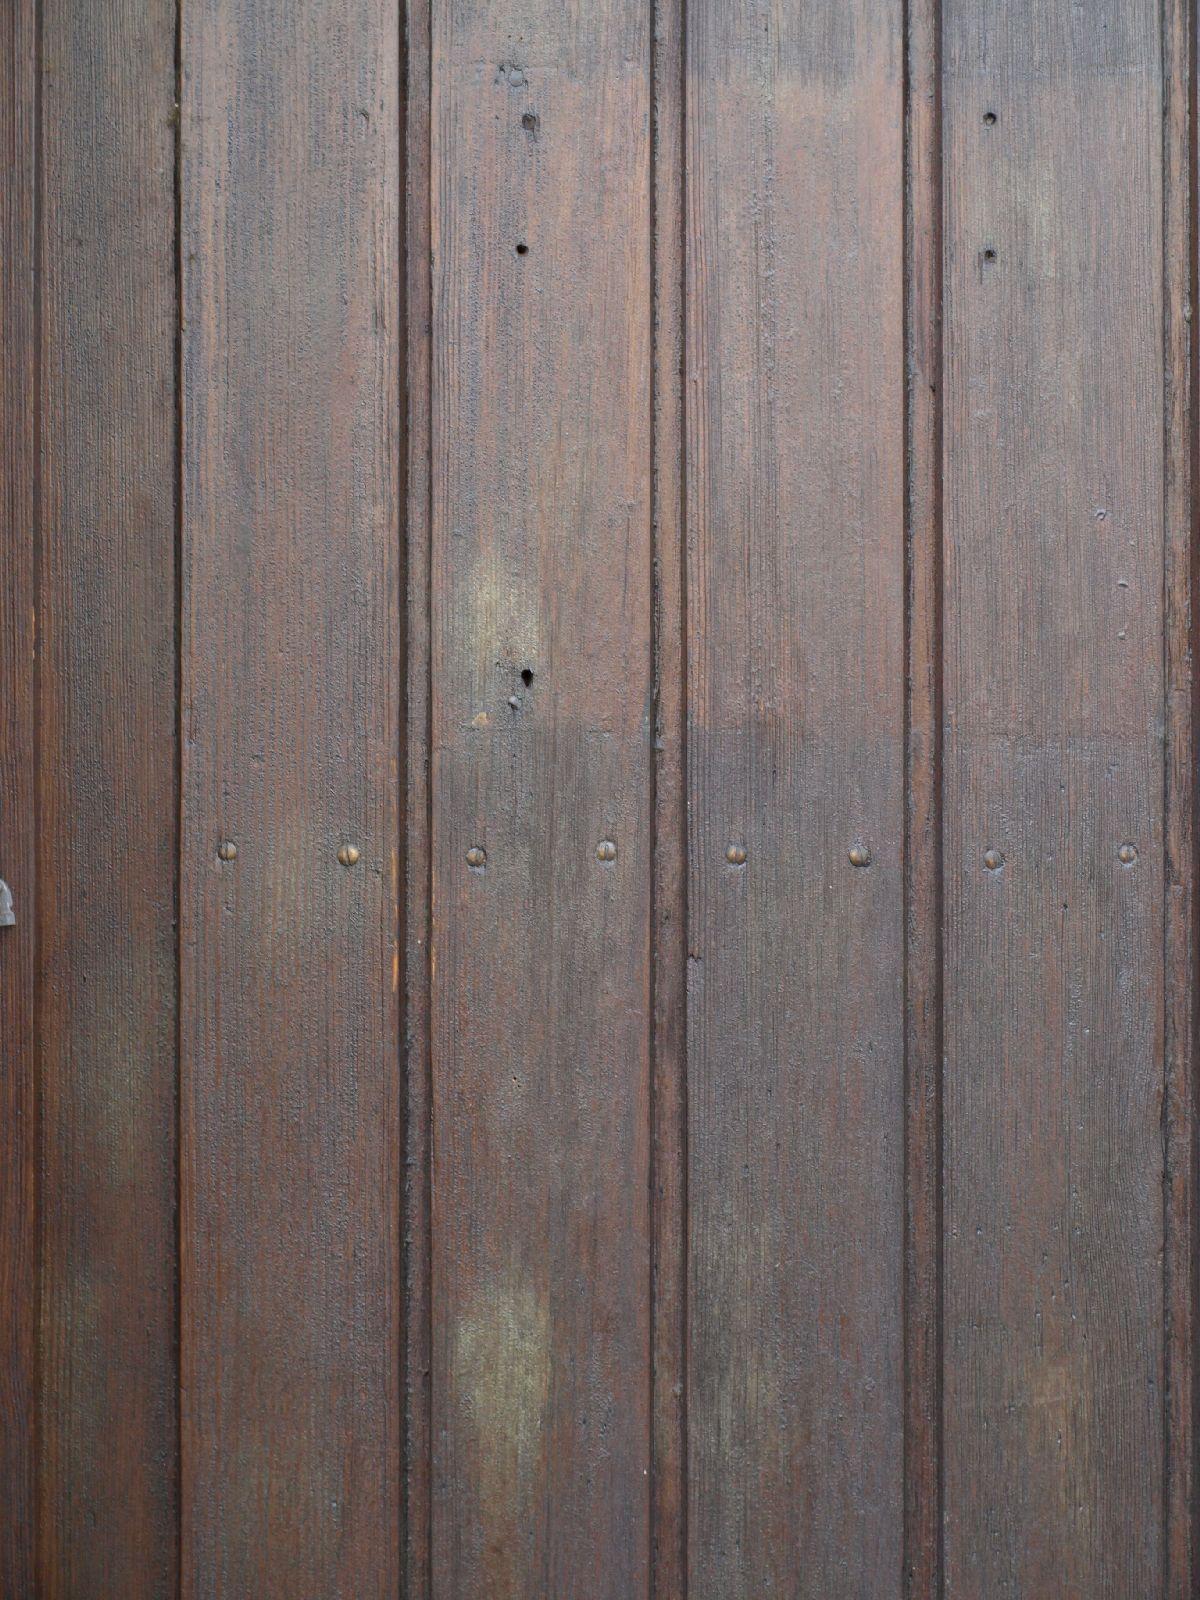 Wood_Texture_A_P4131120